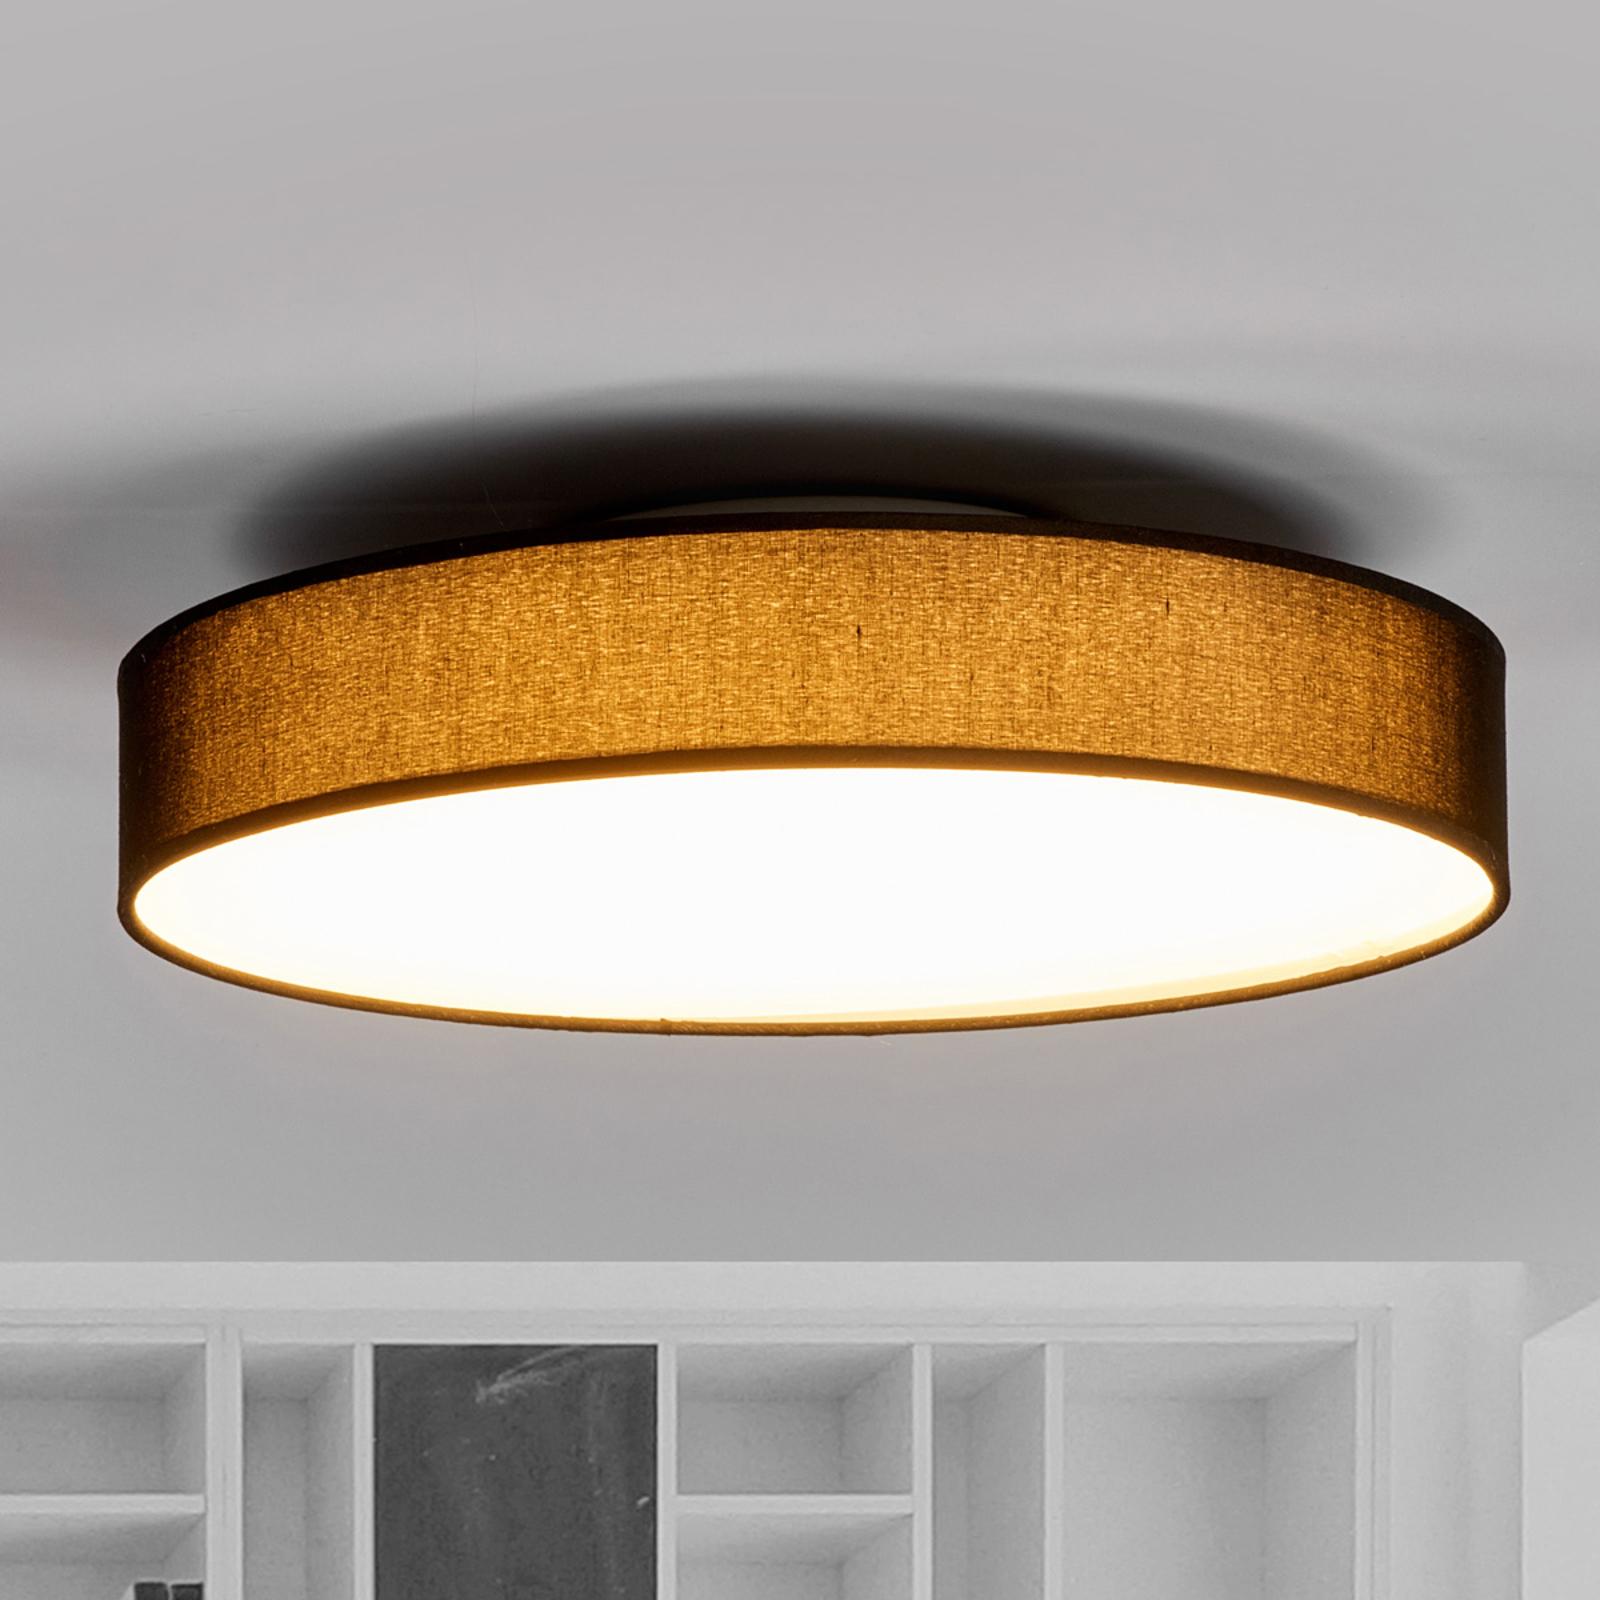 Lampa sufitowa LED z materiału Saira 40 cm czarna